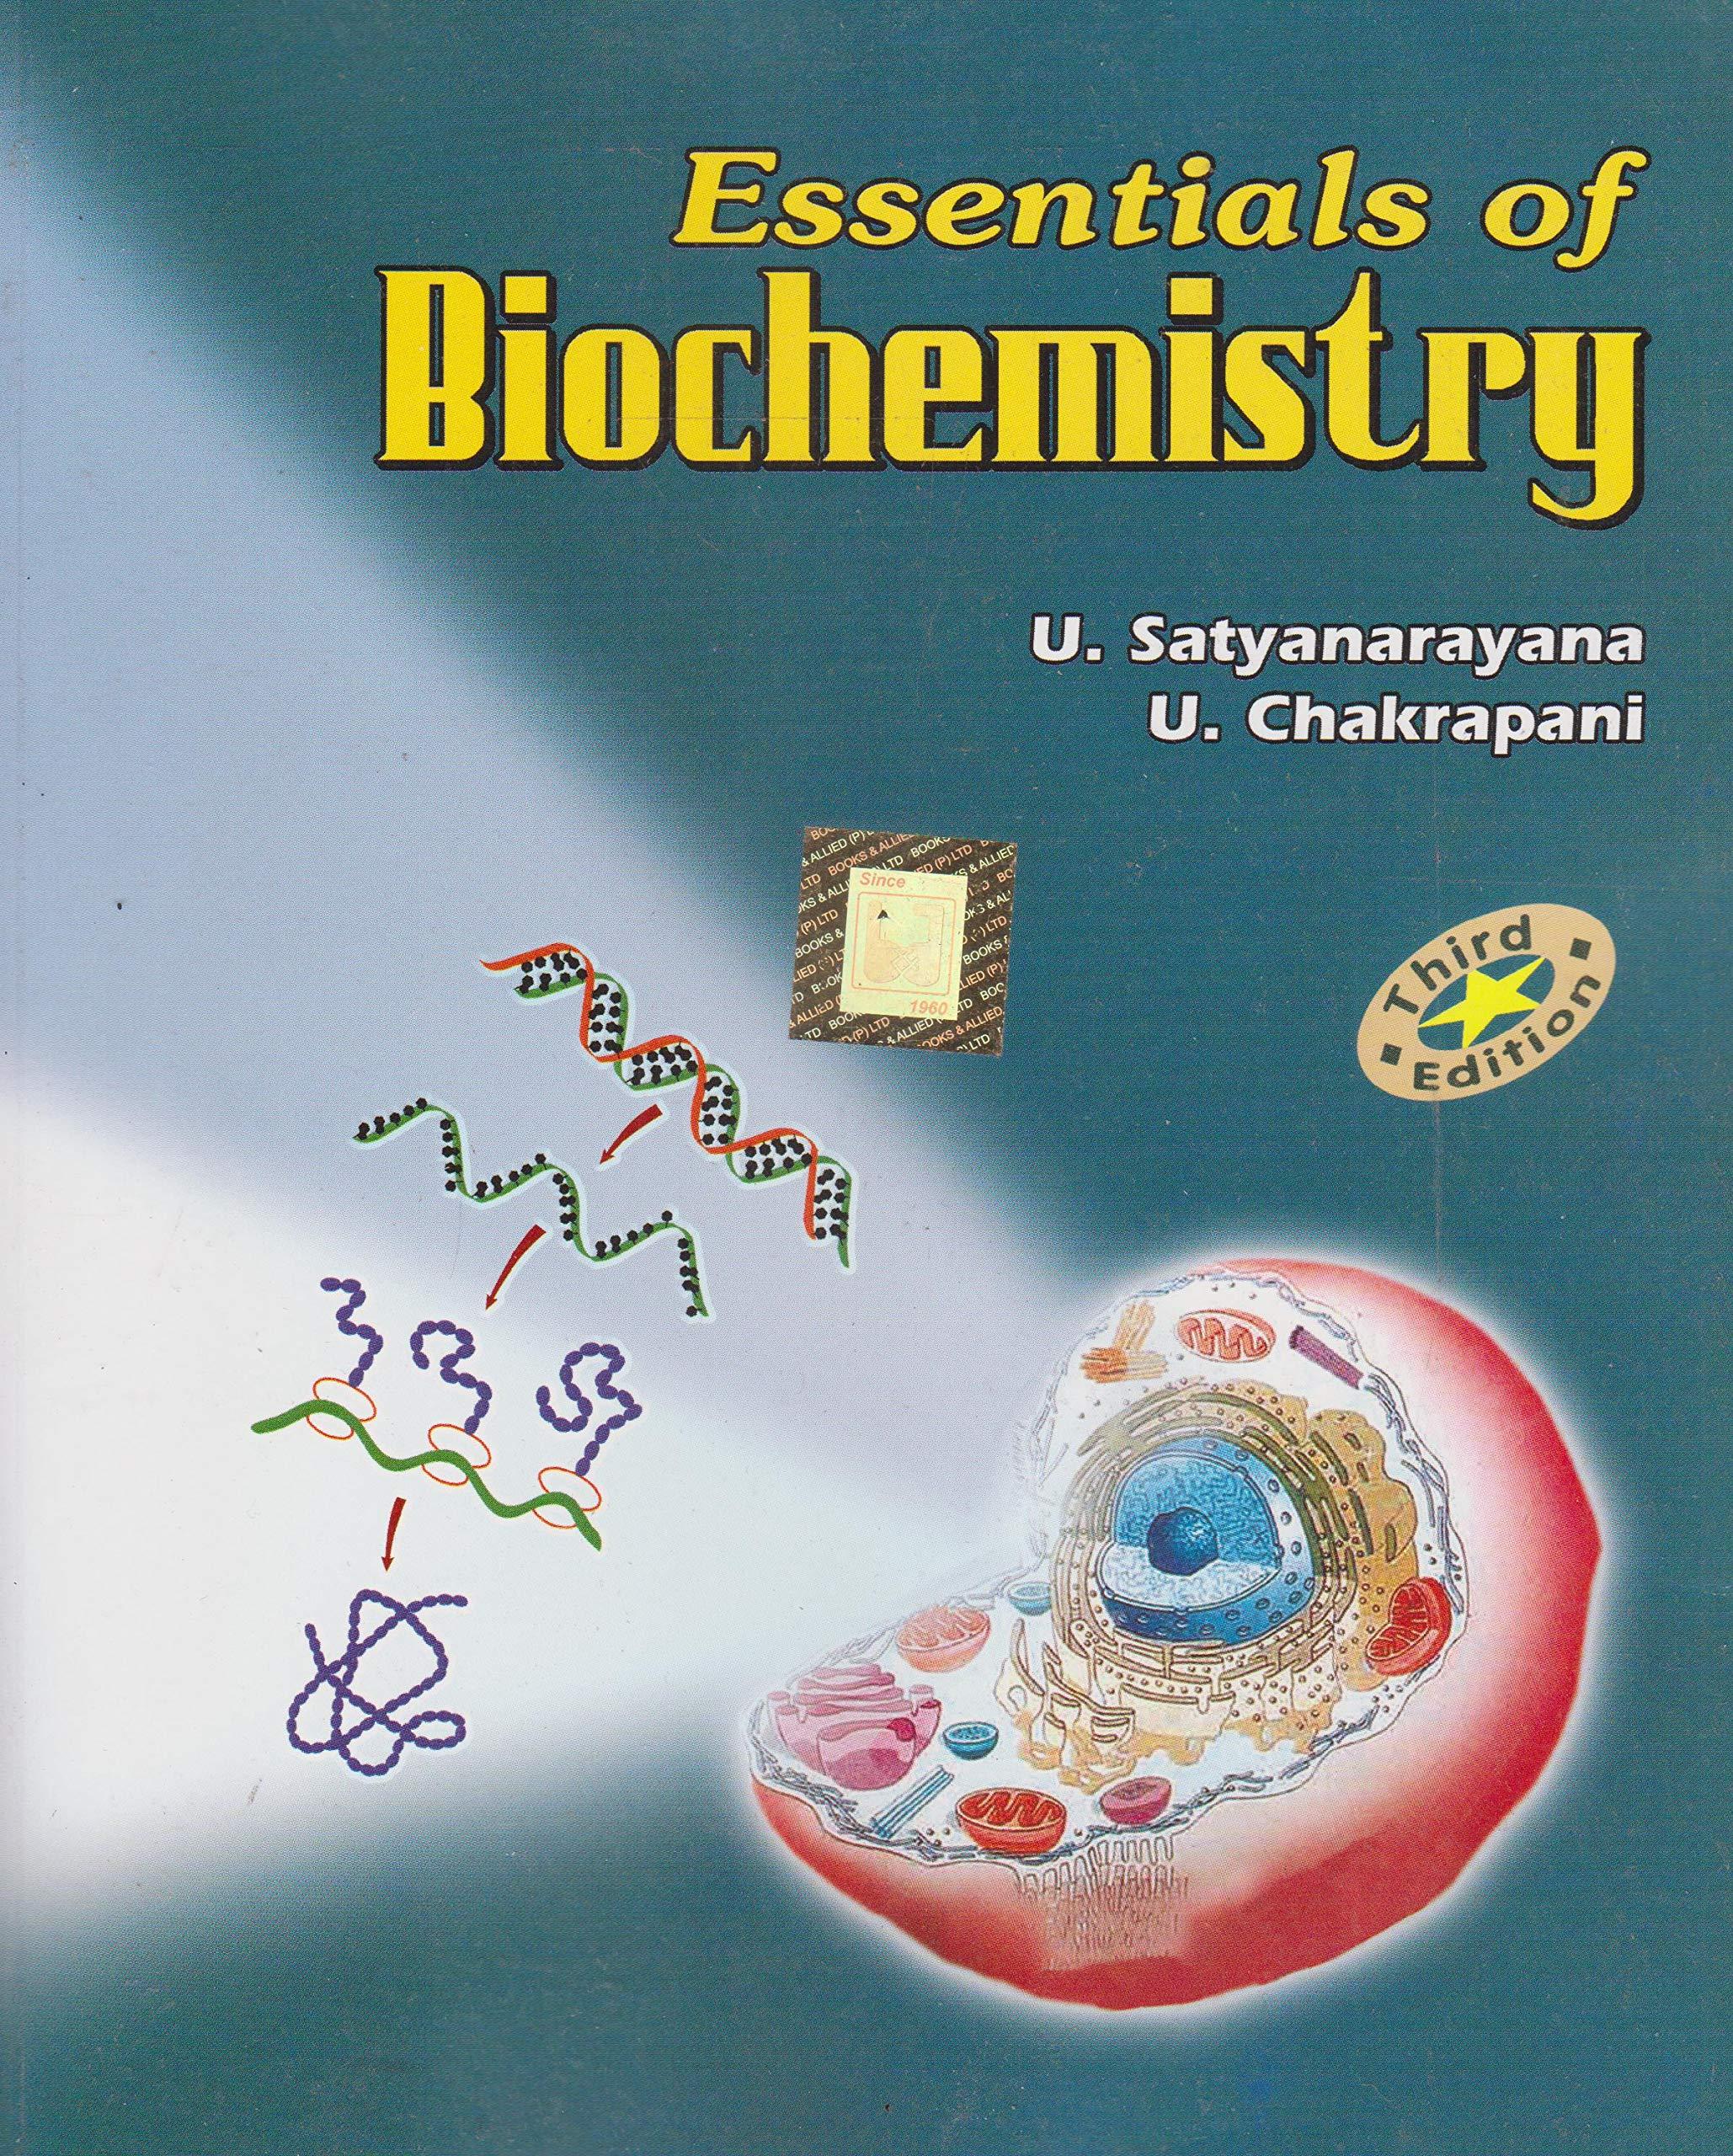 Amazon in: Buy Essentials Of Biochemistry Third Edition Book